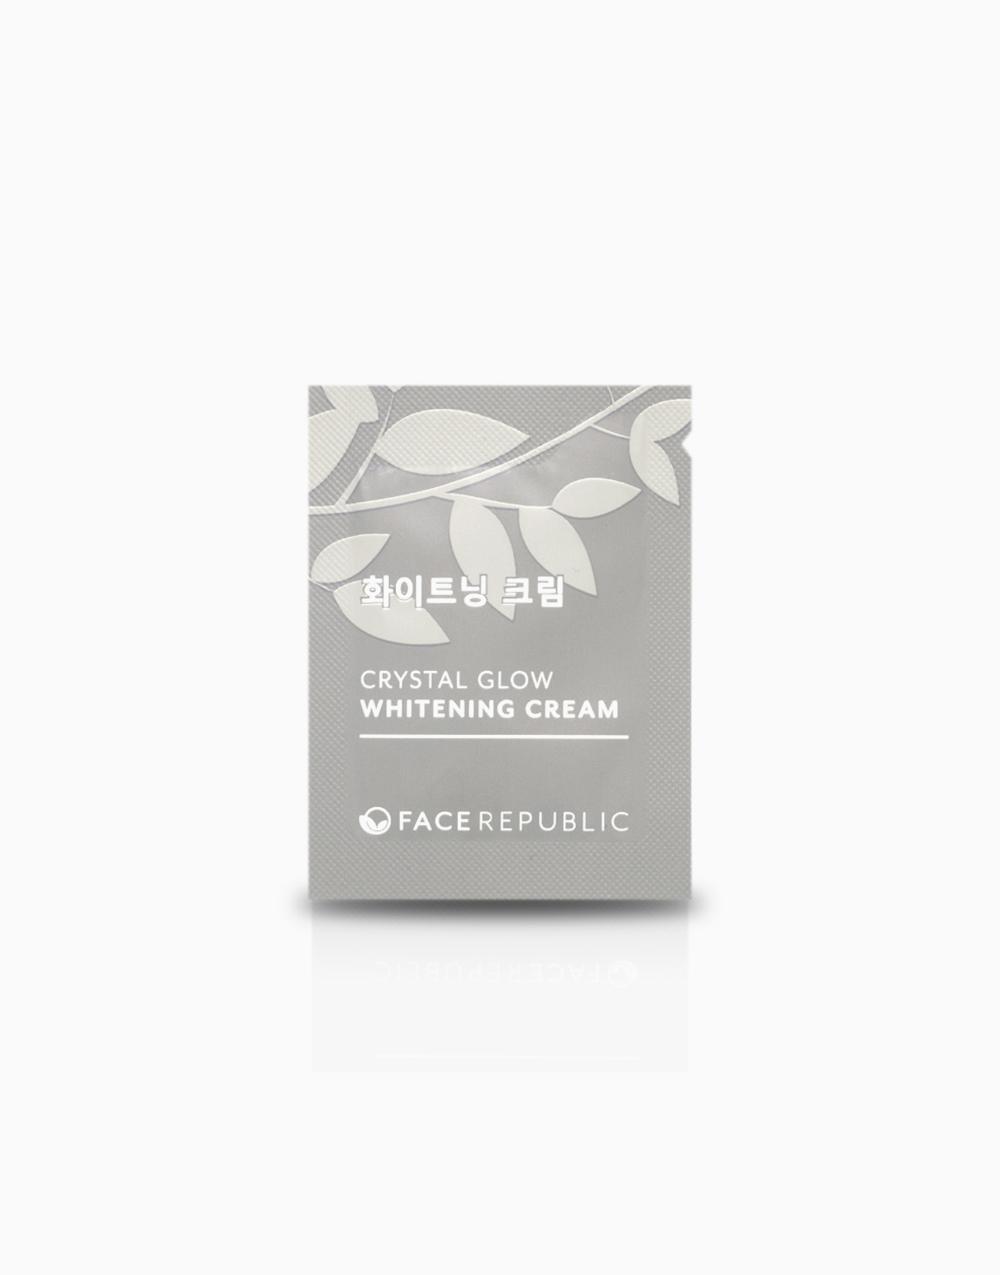 Crystal Glow Whitening Cream 2mL by Face Republic